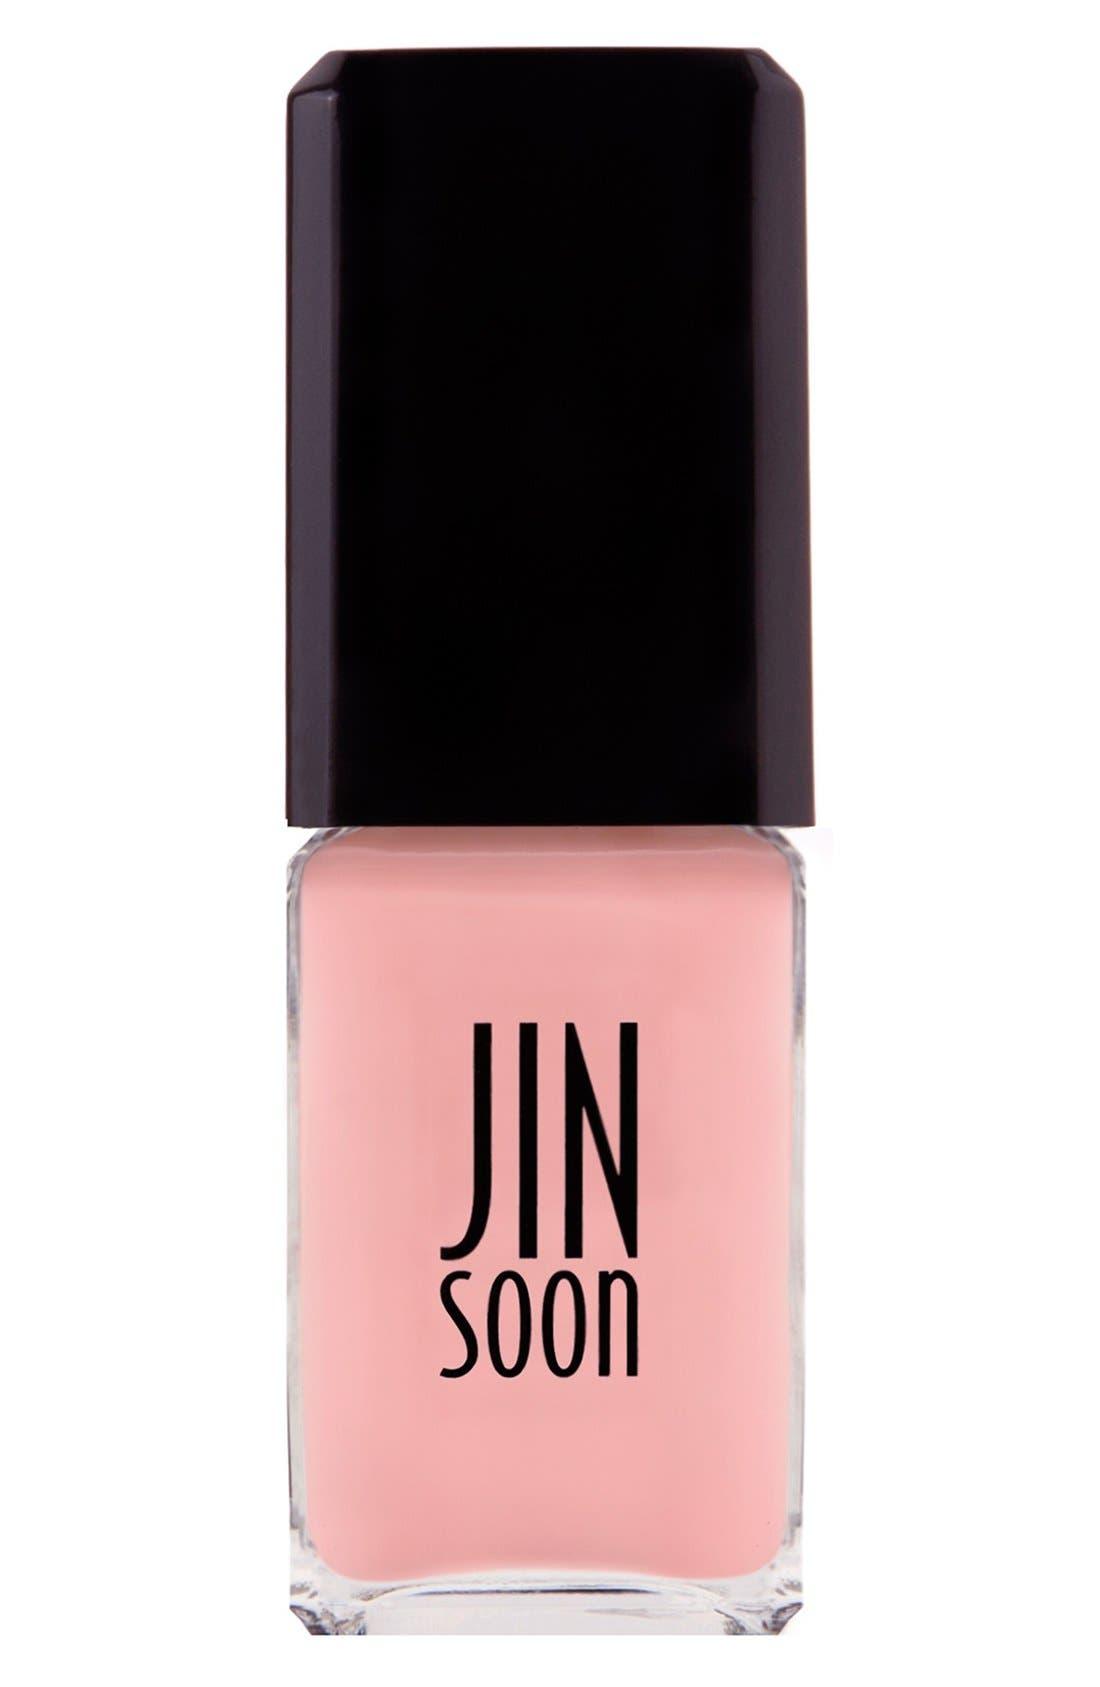 JINsoon 'Dolly Pink' Nail Lacquer